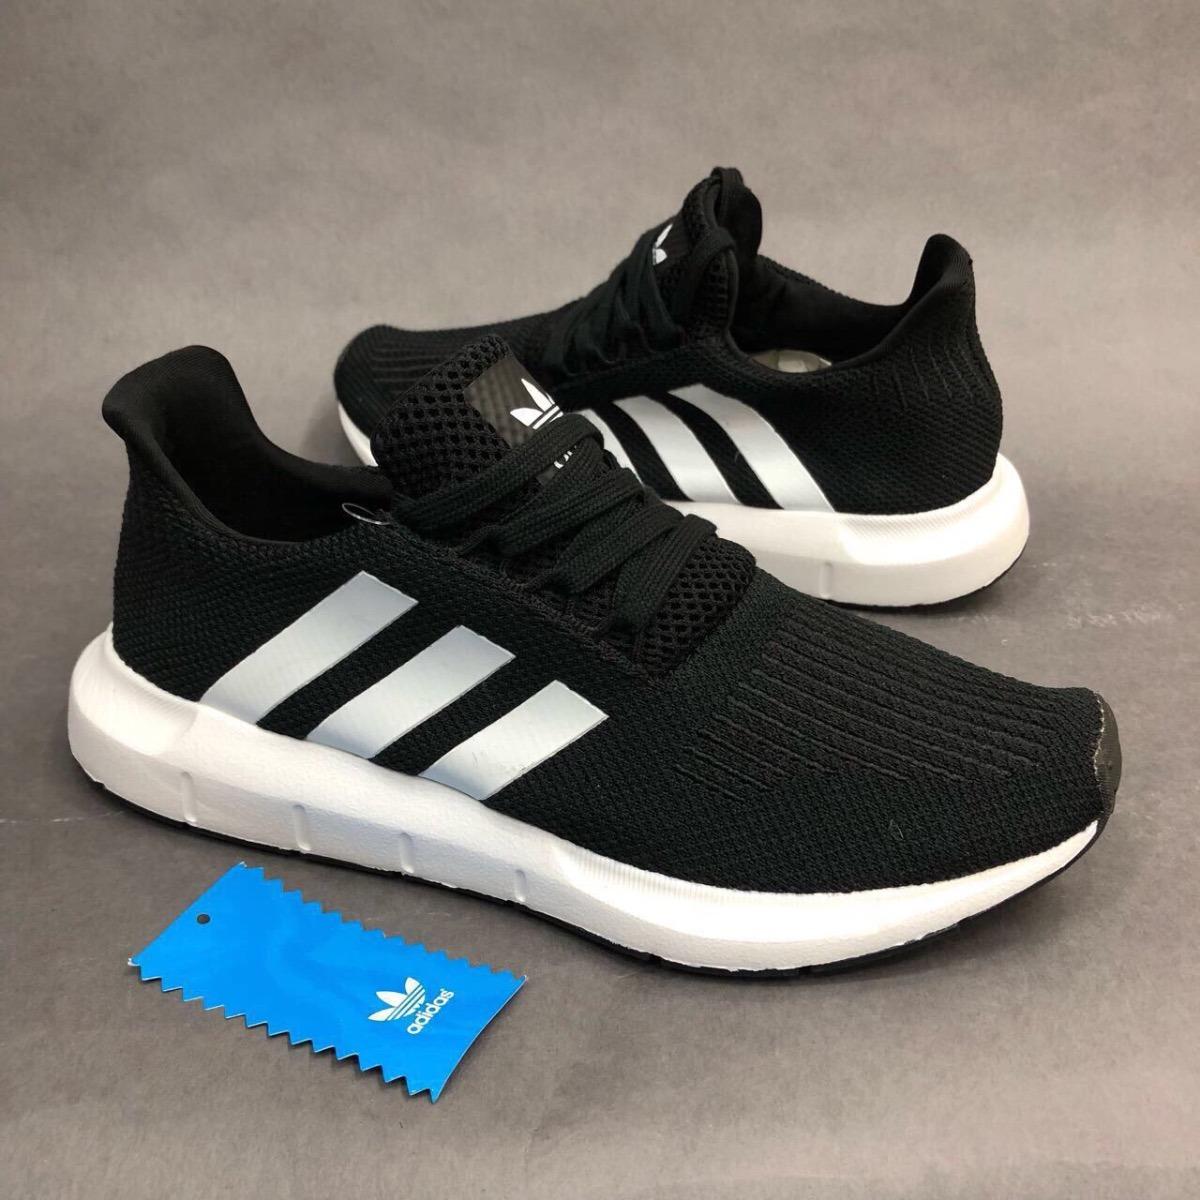 5609ab0d83a3b tenis zapatillas adidas swift run negro gris hombre env gr. Cargando zoom.